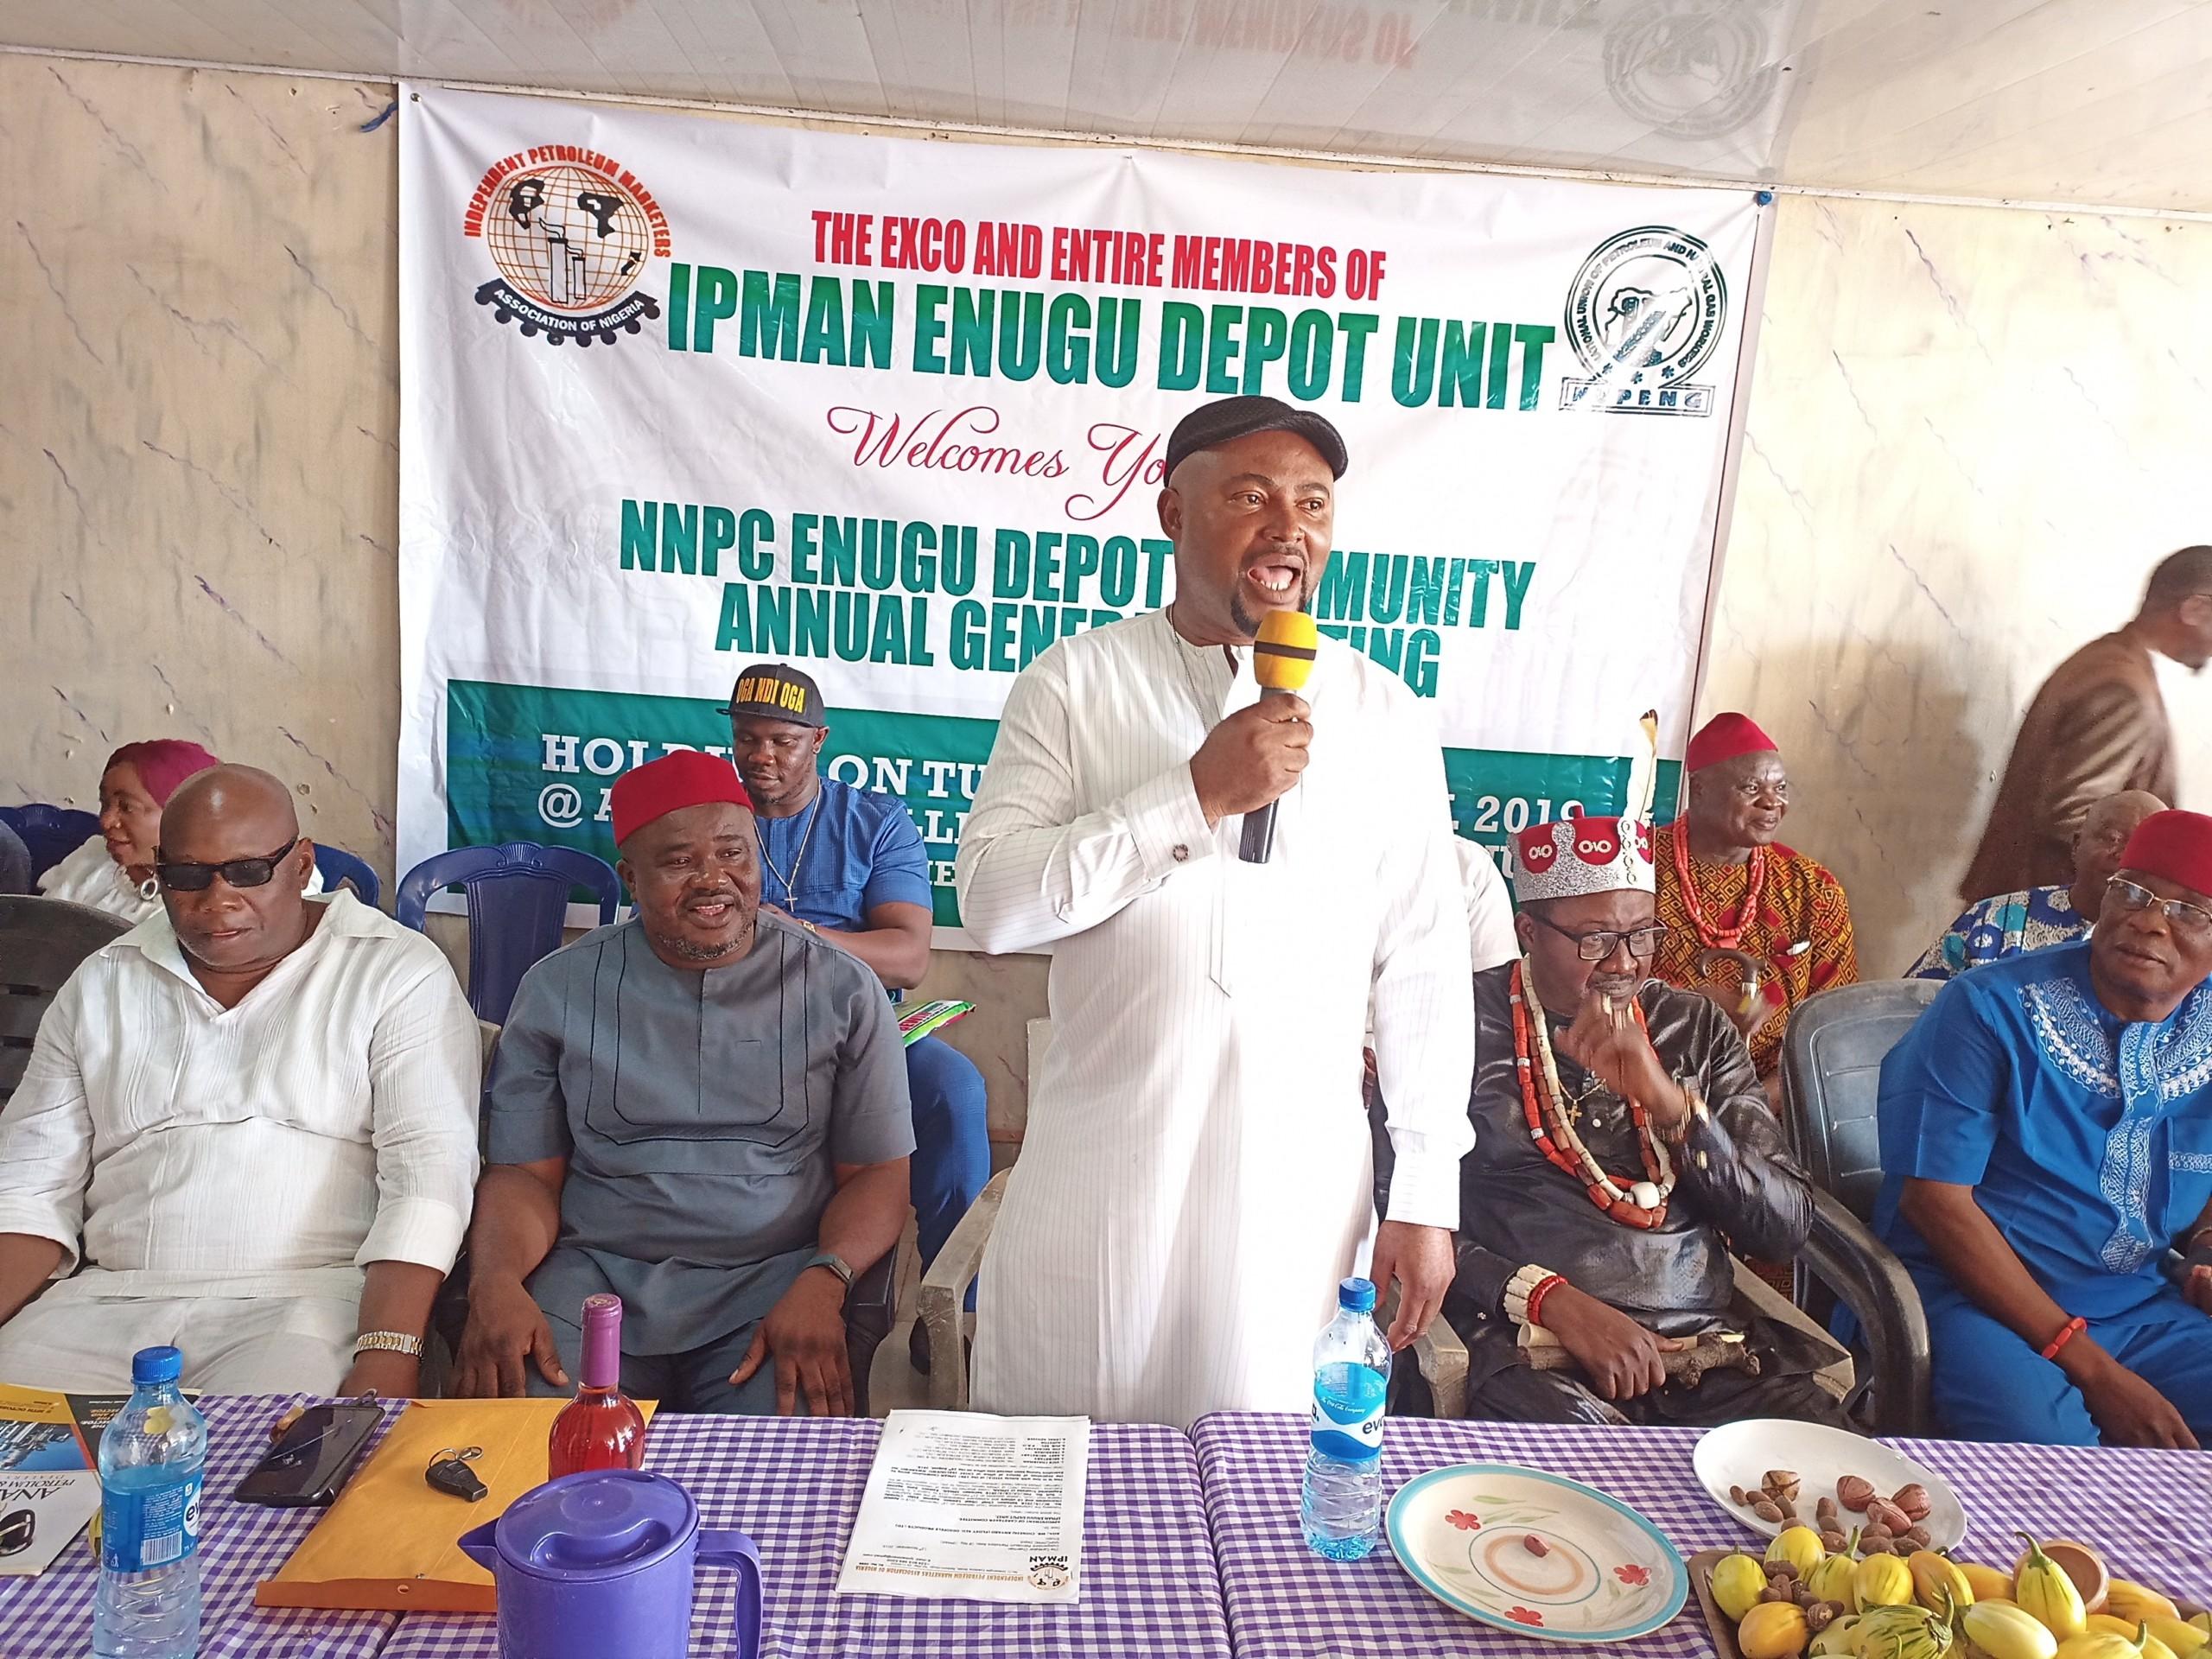 IPMAN, Enugu, NNPC Depot